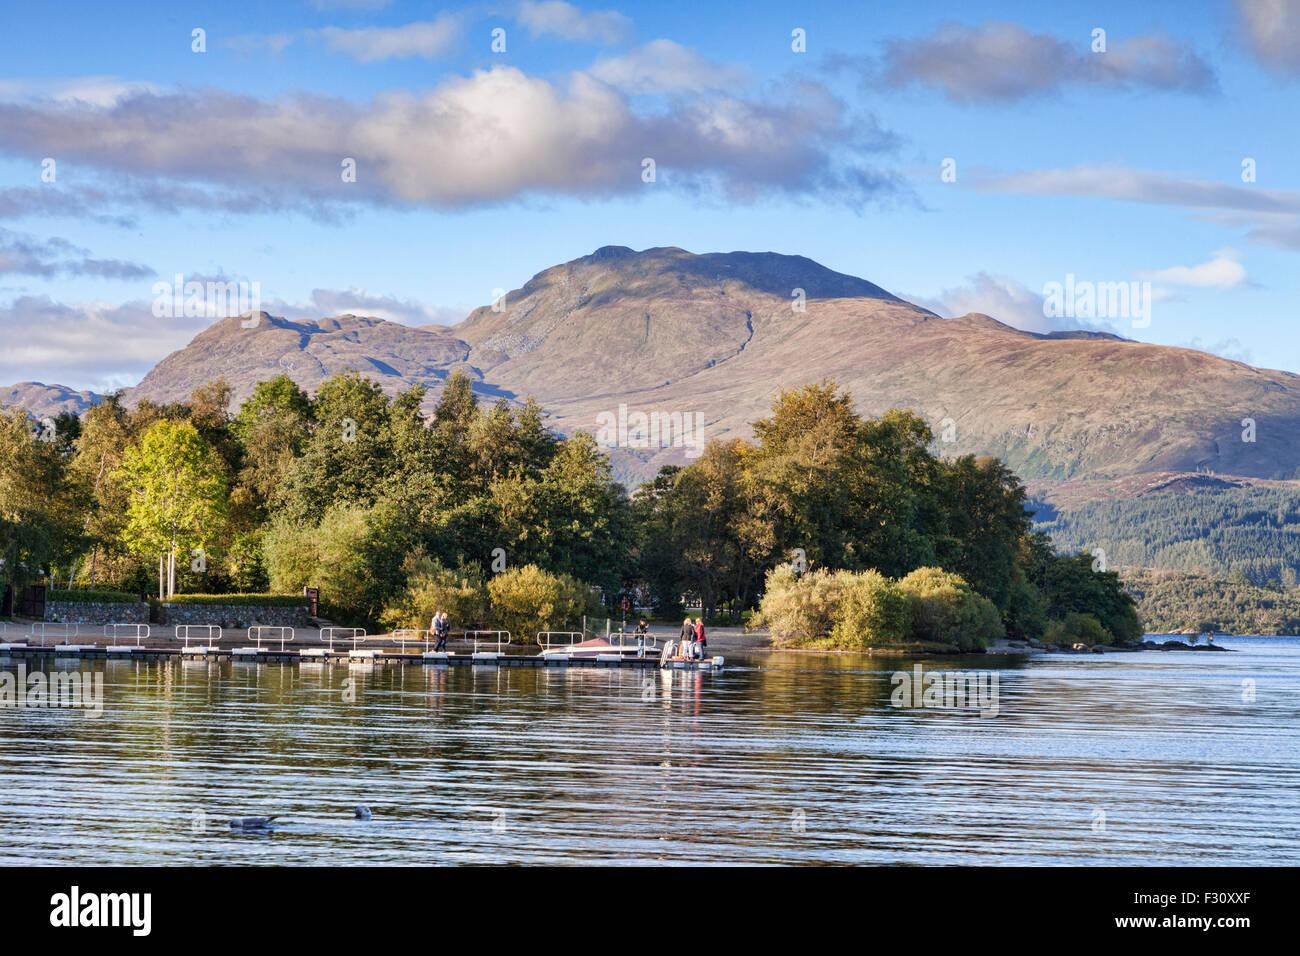 Ben Lomond and Loch Lomond at Luss, Loch Lomond and the Trossachs National Park, Stirling, Scotland, UK. - Stock Image